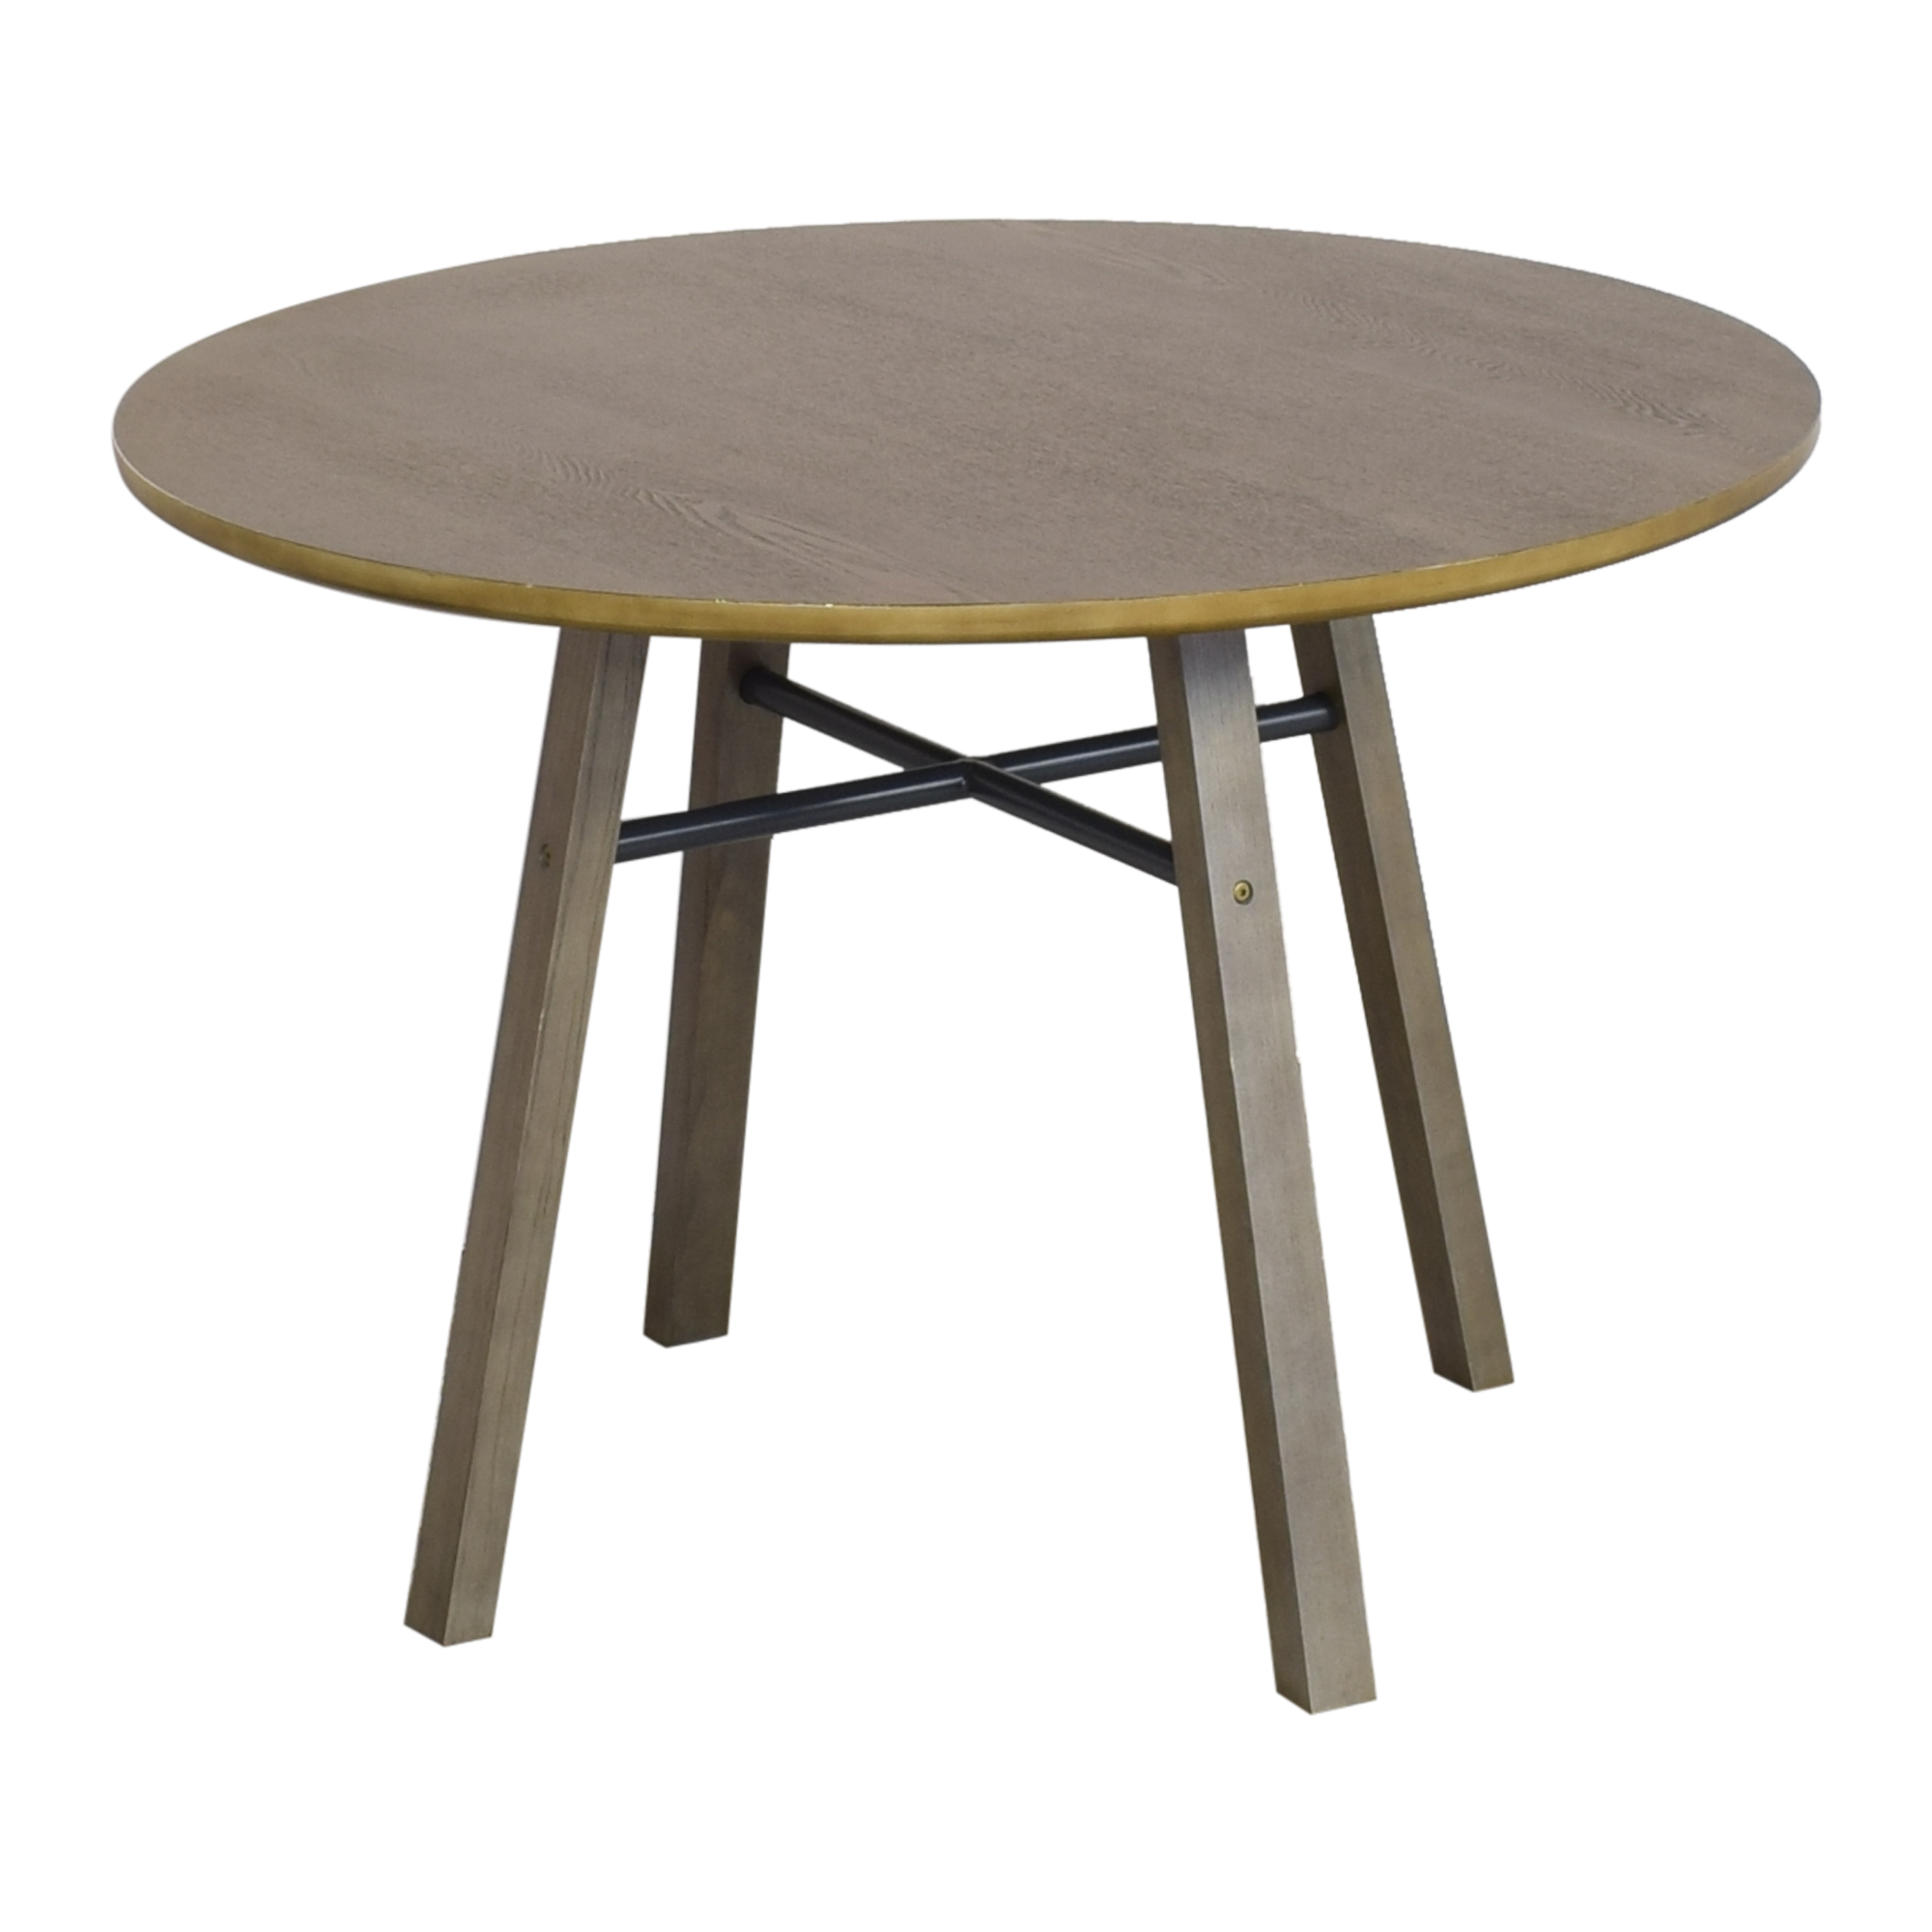 Crate & Barrel Crate & Barrel Dining Table on sale